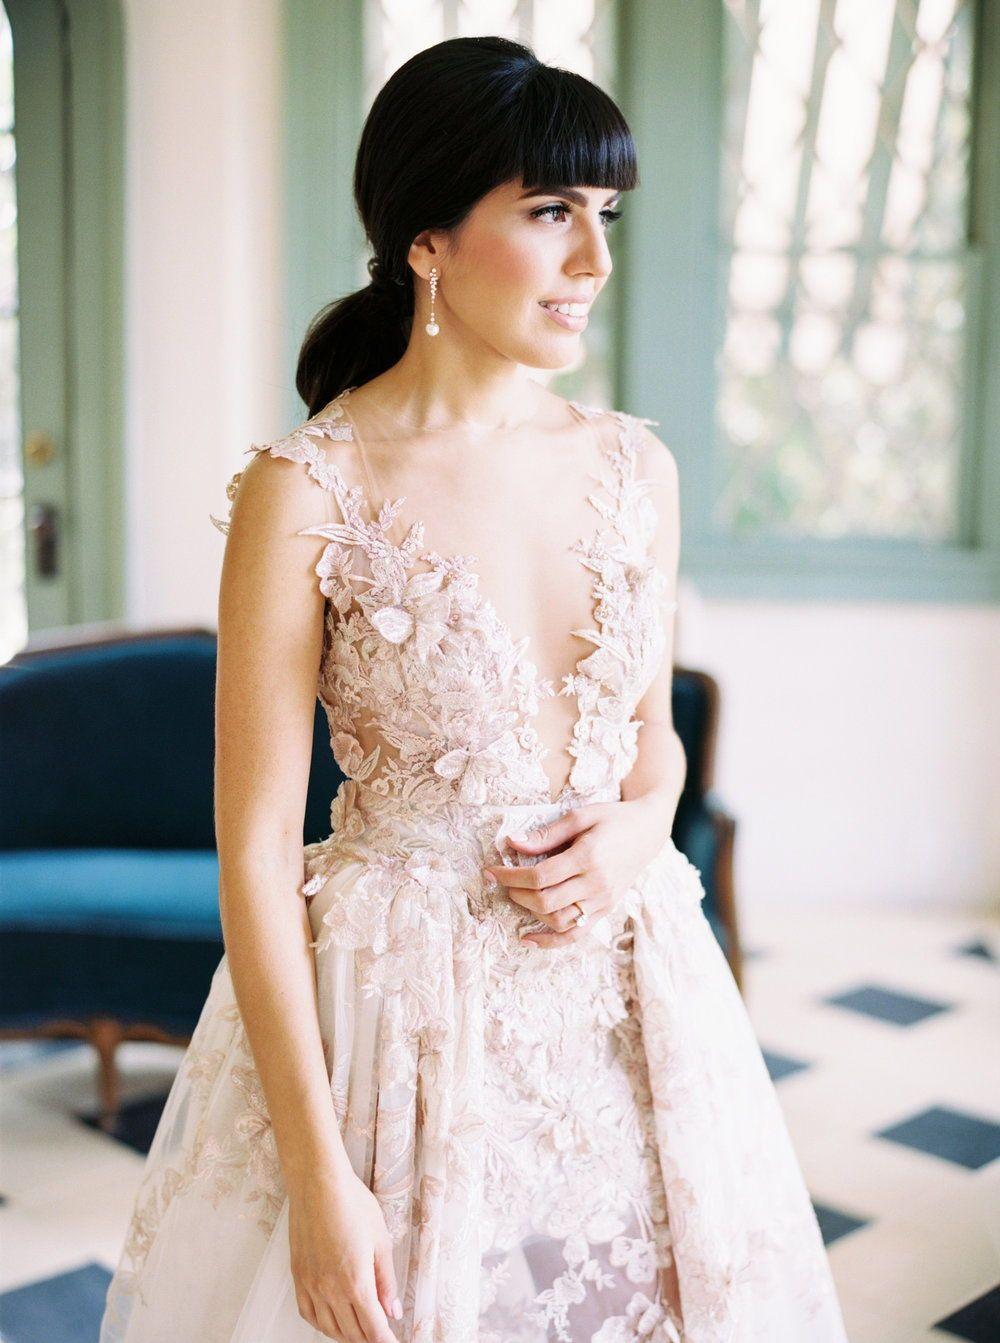 0188d44f192f A closer look atbeautiful #GLbride Laura Martinez's stunning #Llilyrose Galia  Lahav wedding dress. From the blush pink tone to the hand appliqués ...